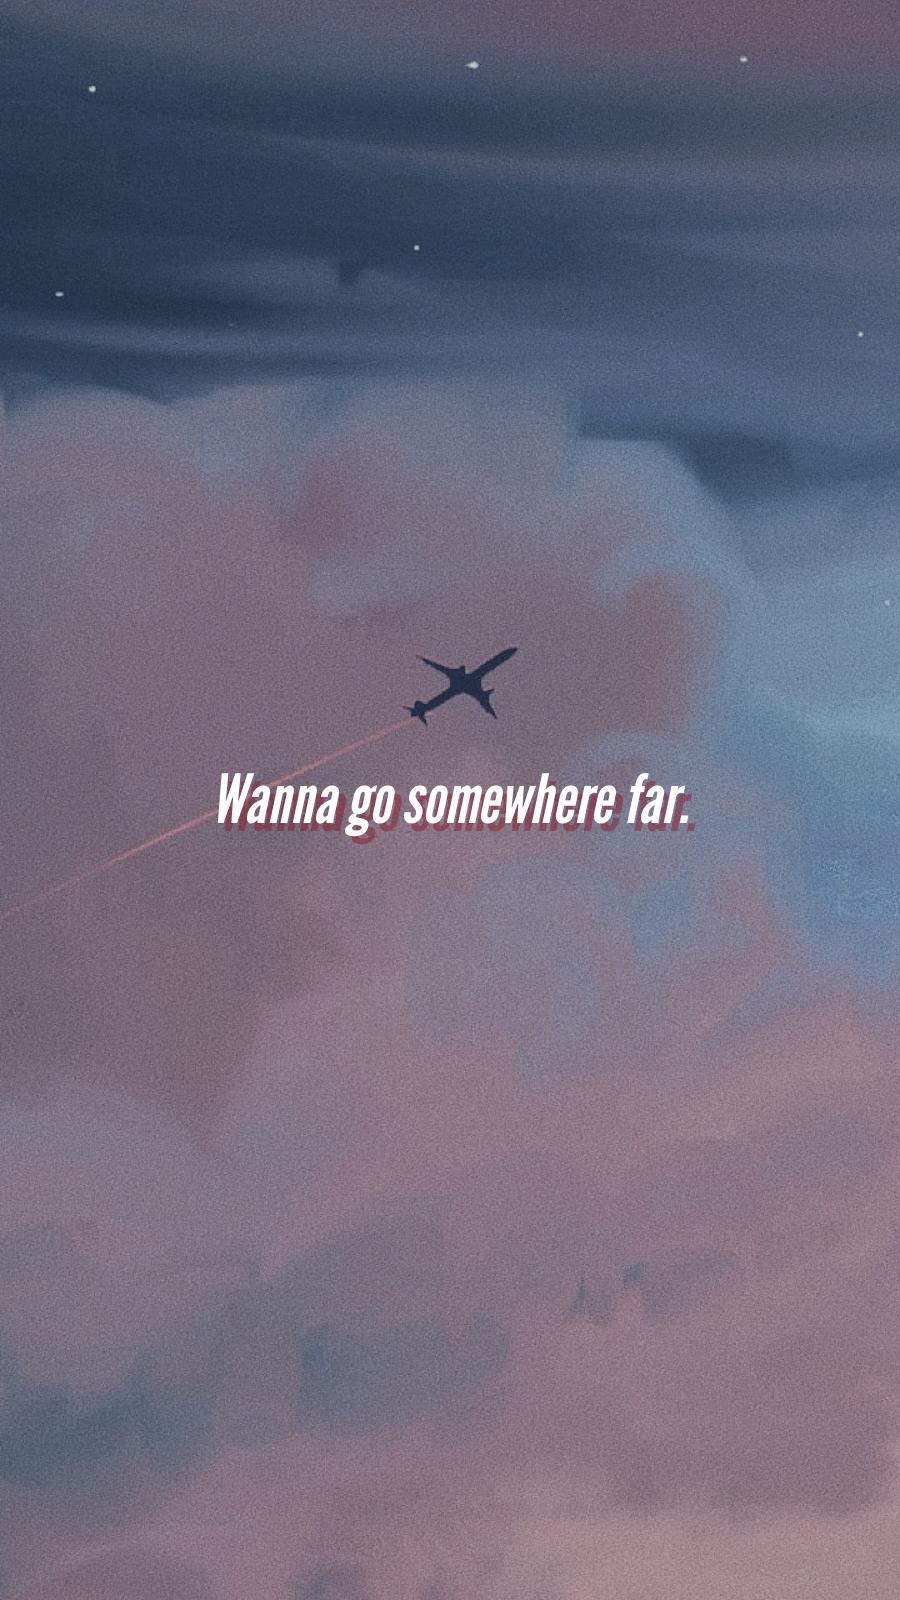 Plane Travel Phonewallpaper Aesthetic Words Aesthetic Pastel Wallpaper Wallpaper Quotes